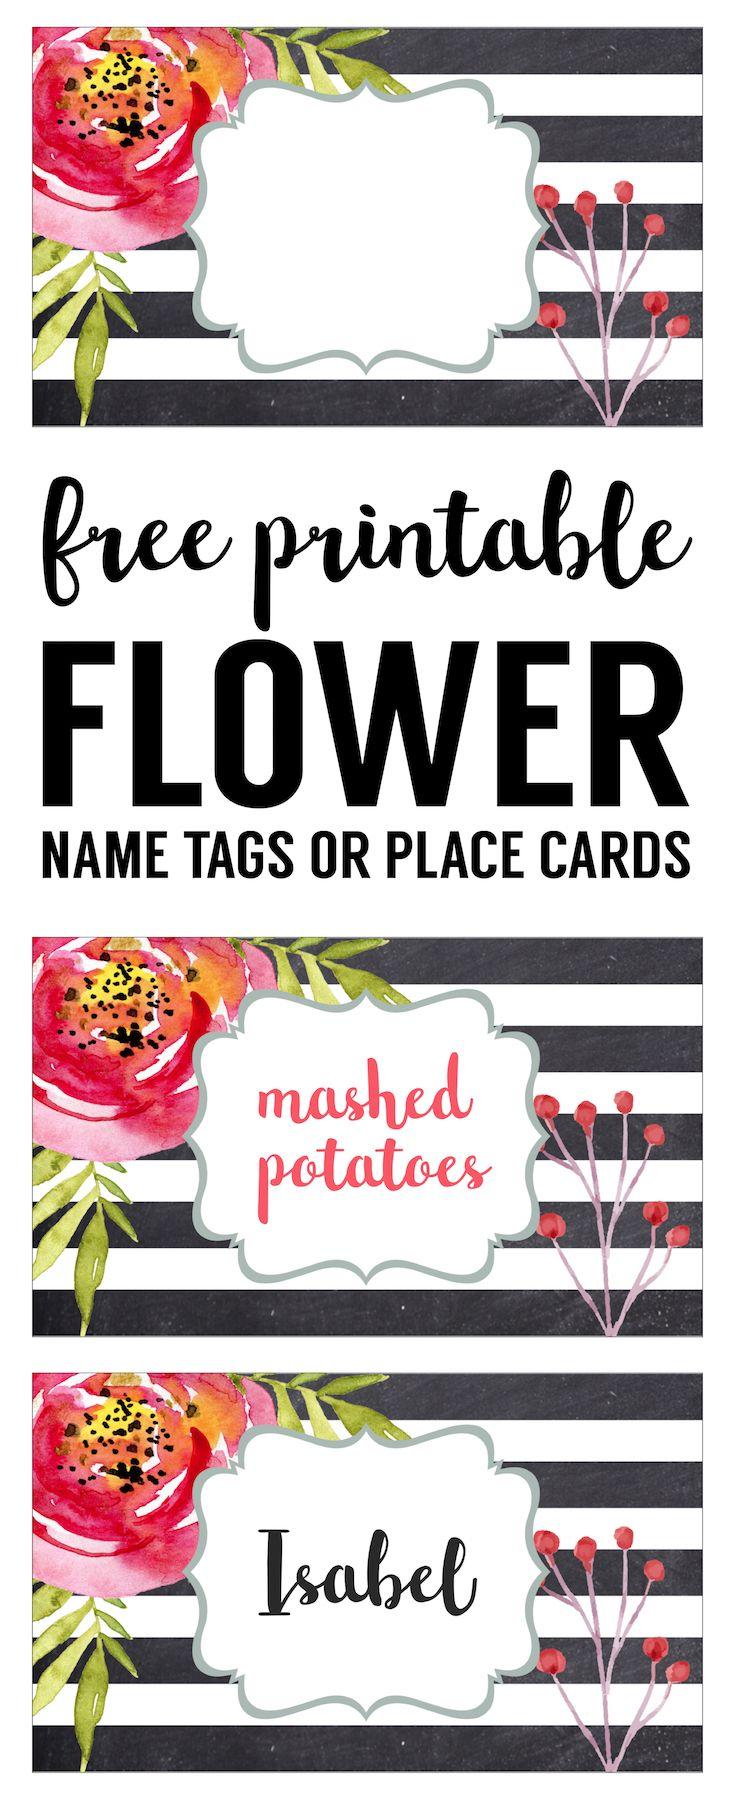 Flower Place Card Holder Or Food Labels Free Printable Paper Trail Design Diy Name Tags Labels Printables Free Flower Place Card Holder